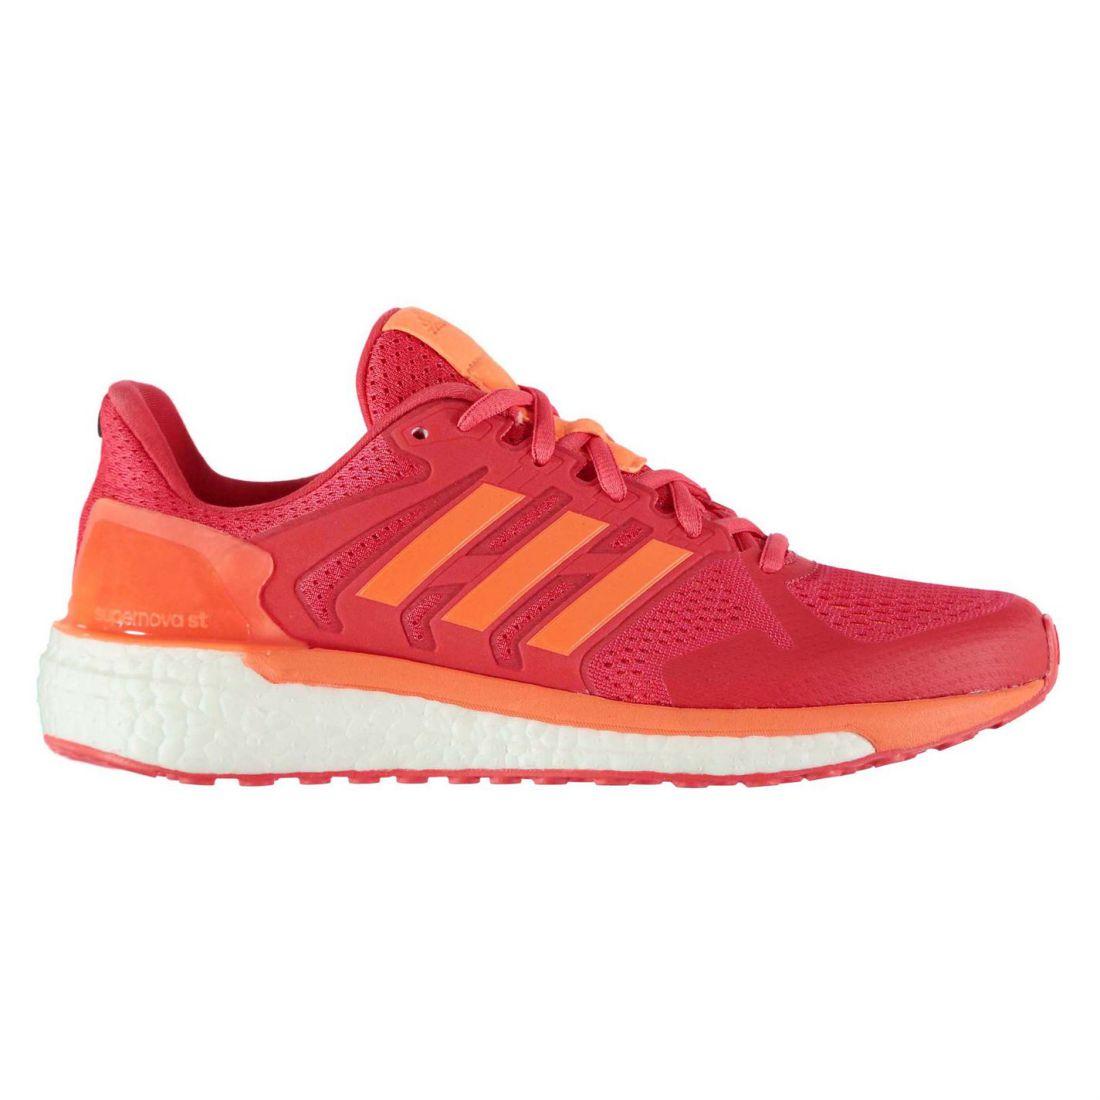 premium selection d2a93 3edaa Image is loading adidas-Womens-Supernova-ST-Running-Shoes-Road-Mesh-